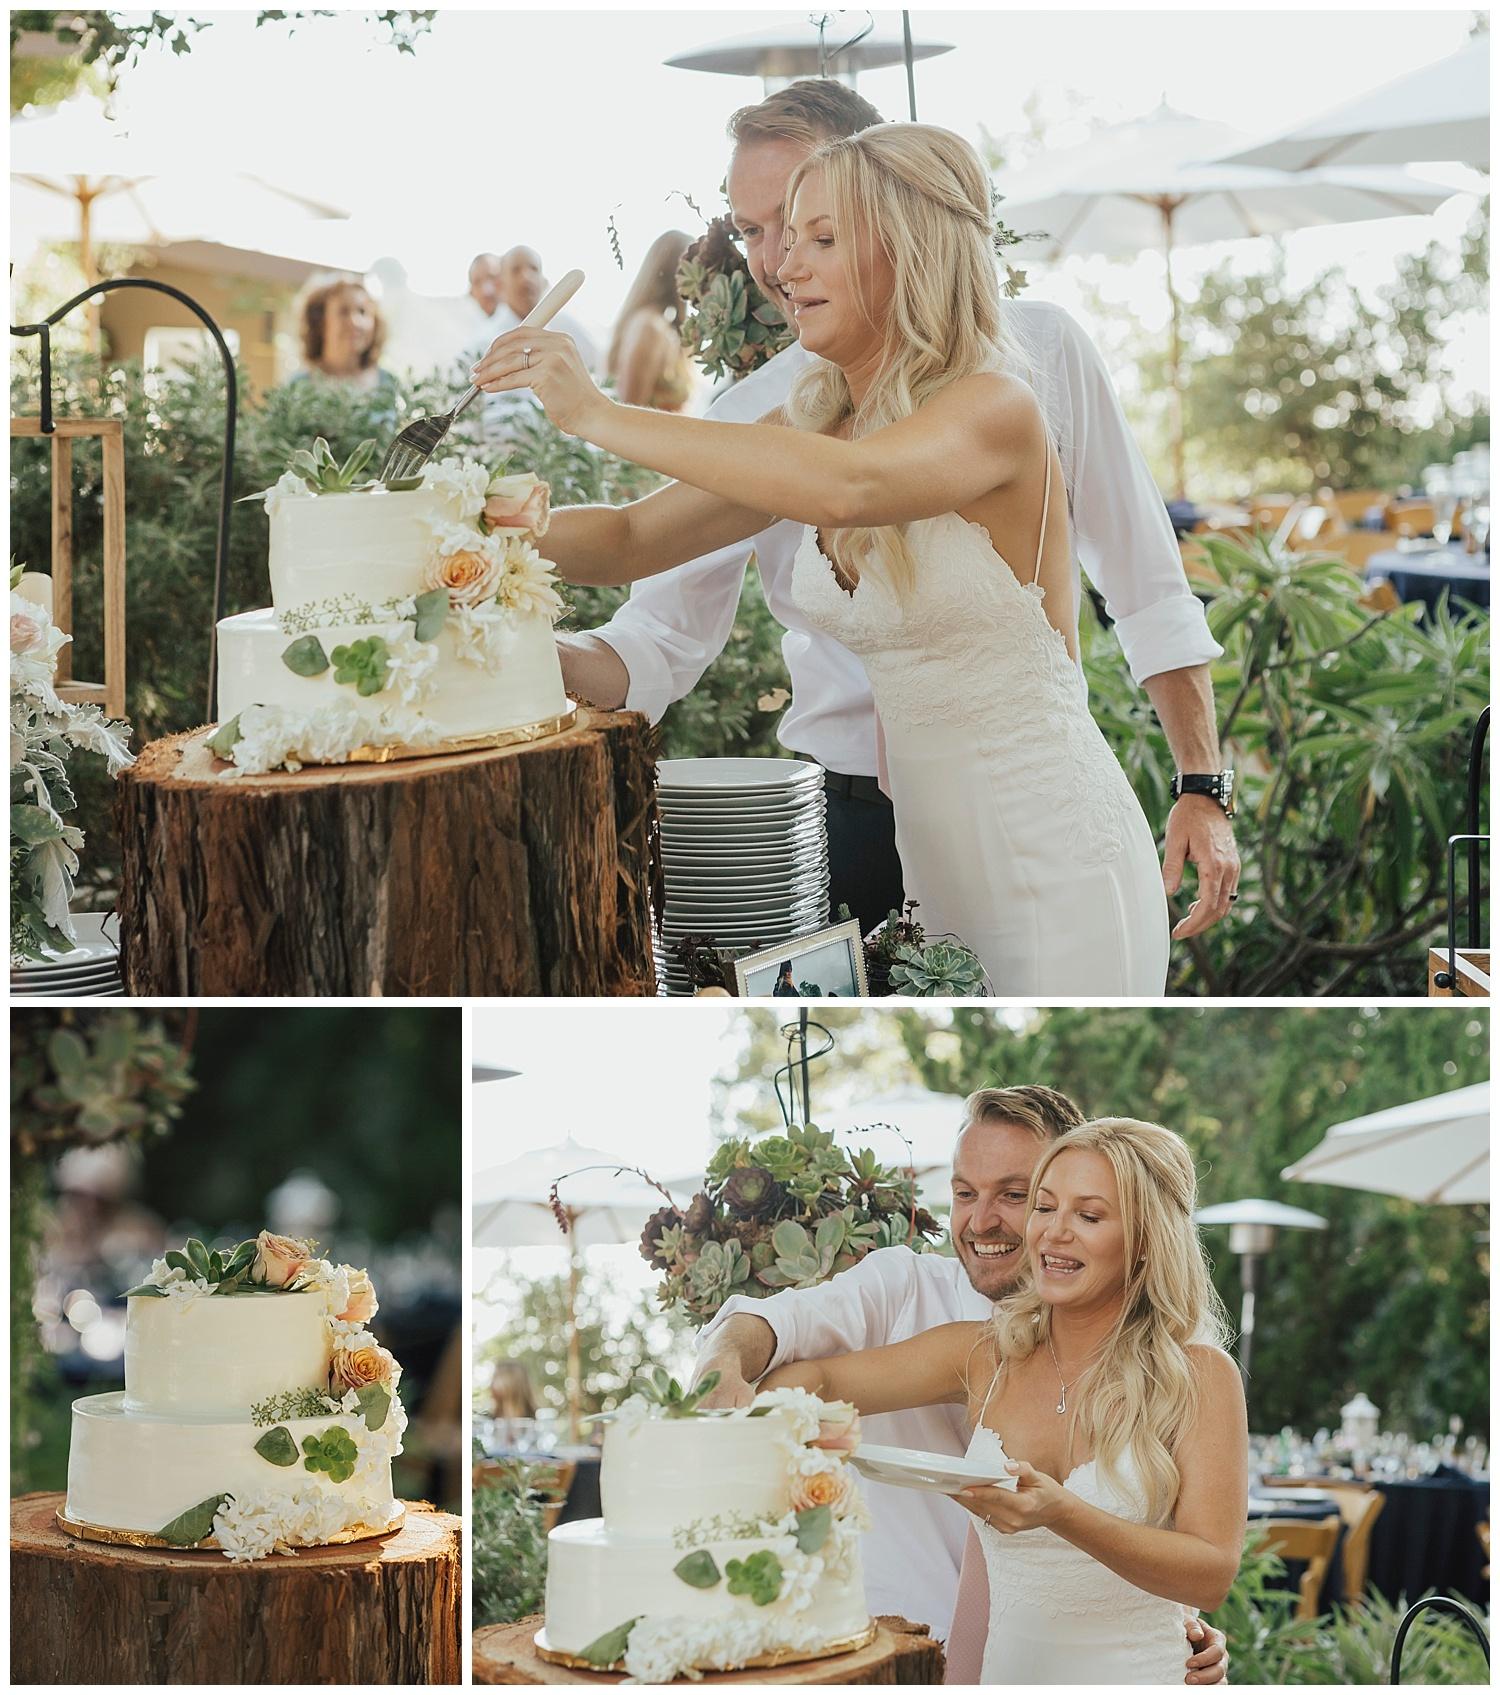 big-sur-summer-wedding-cake-cutting-ceremony-carol-oliva-photography.jpg